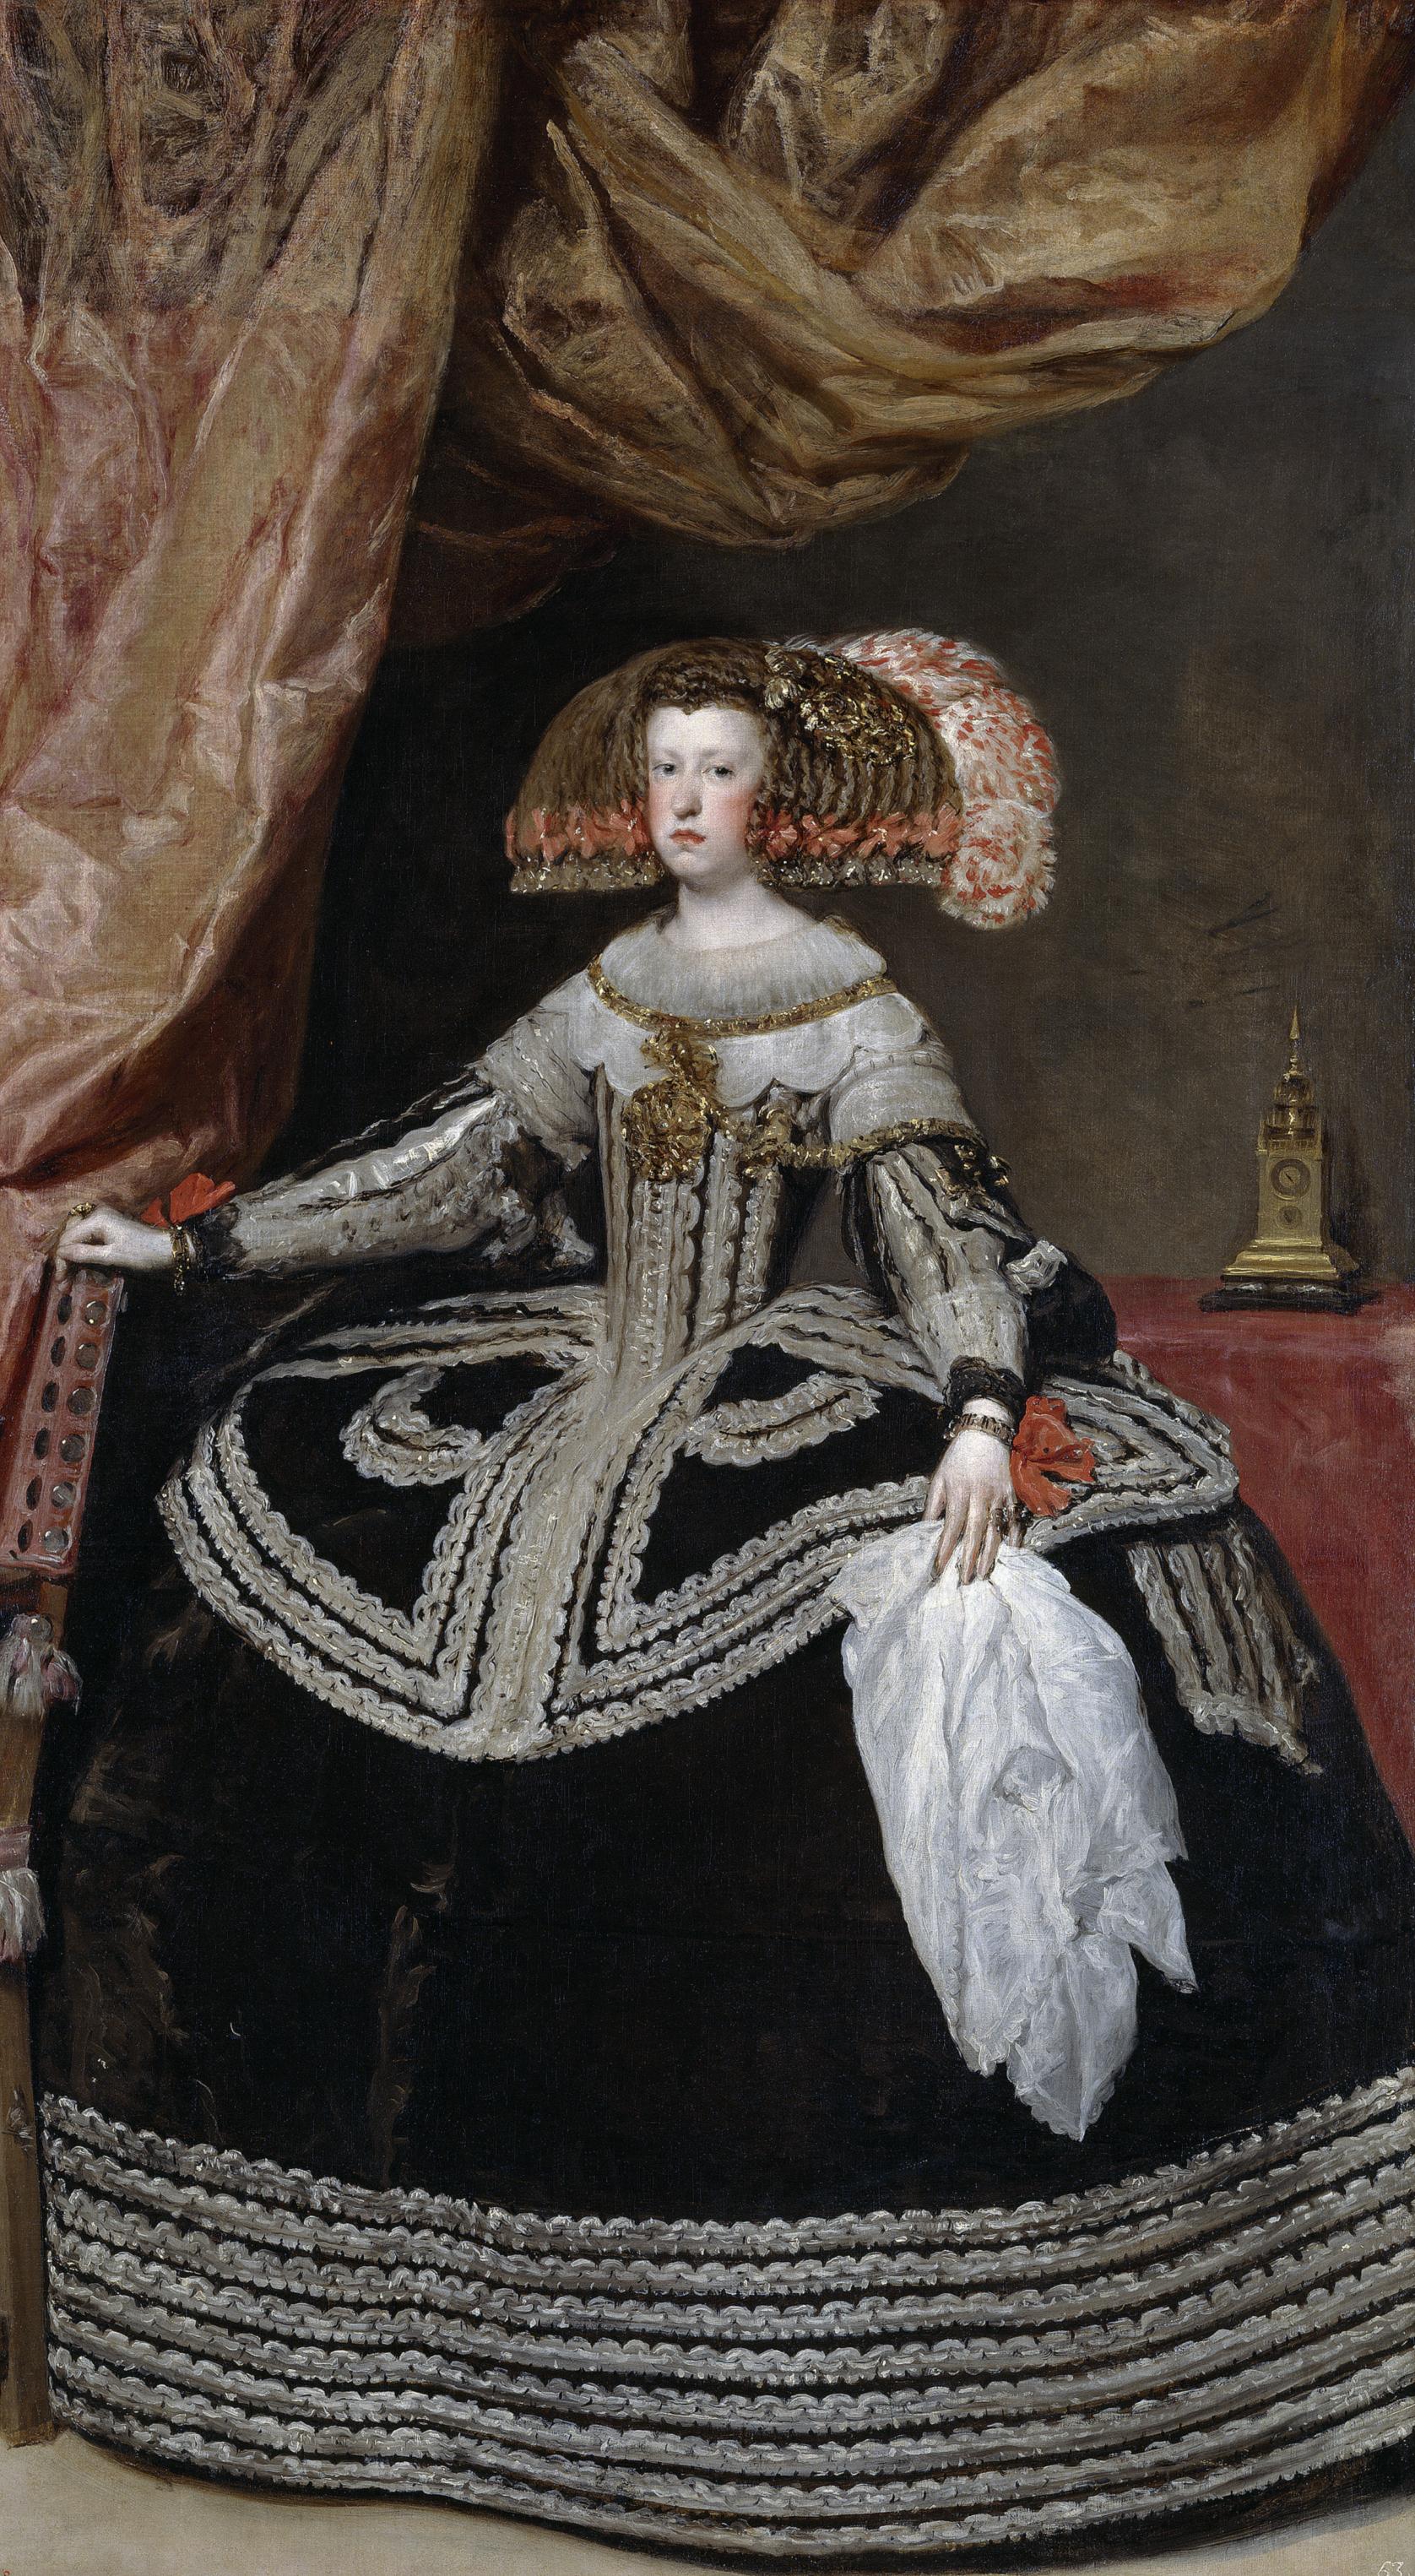 Diego Velázquez.  Mariana of Austria, Queen of Spain , c. 1652